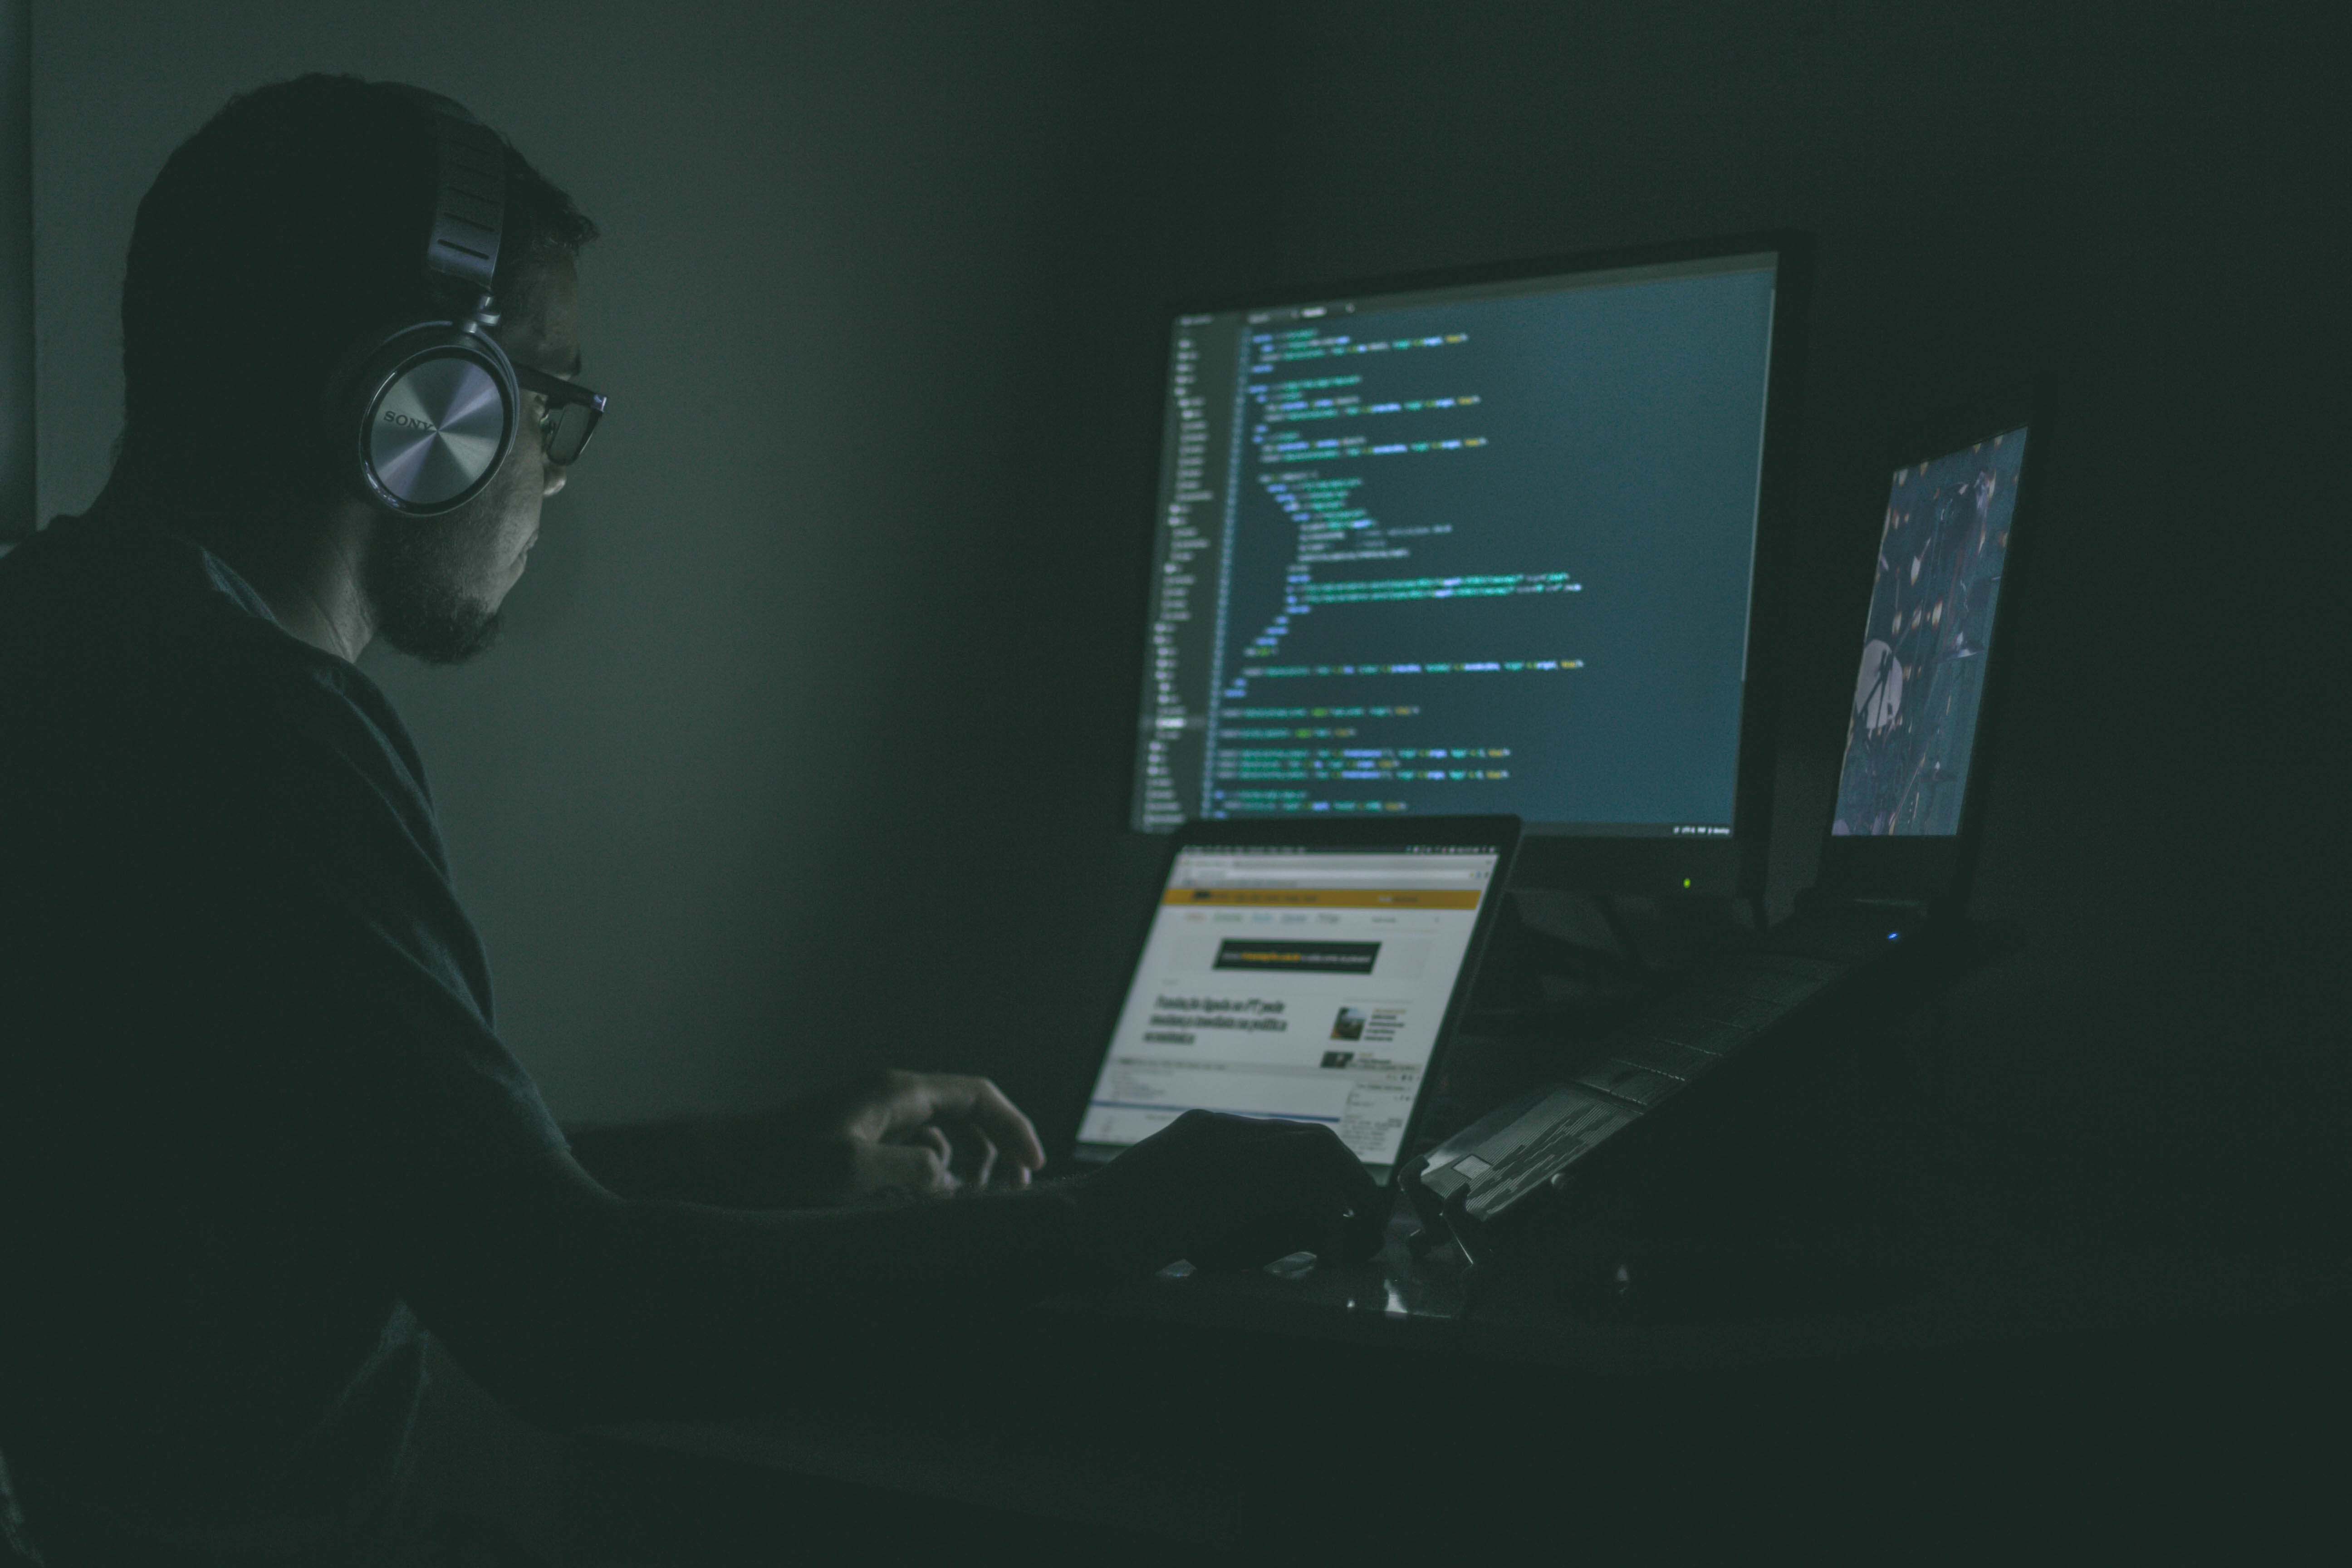 Coding programmer